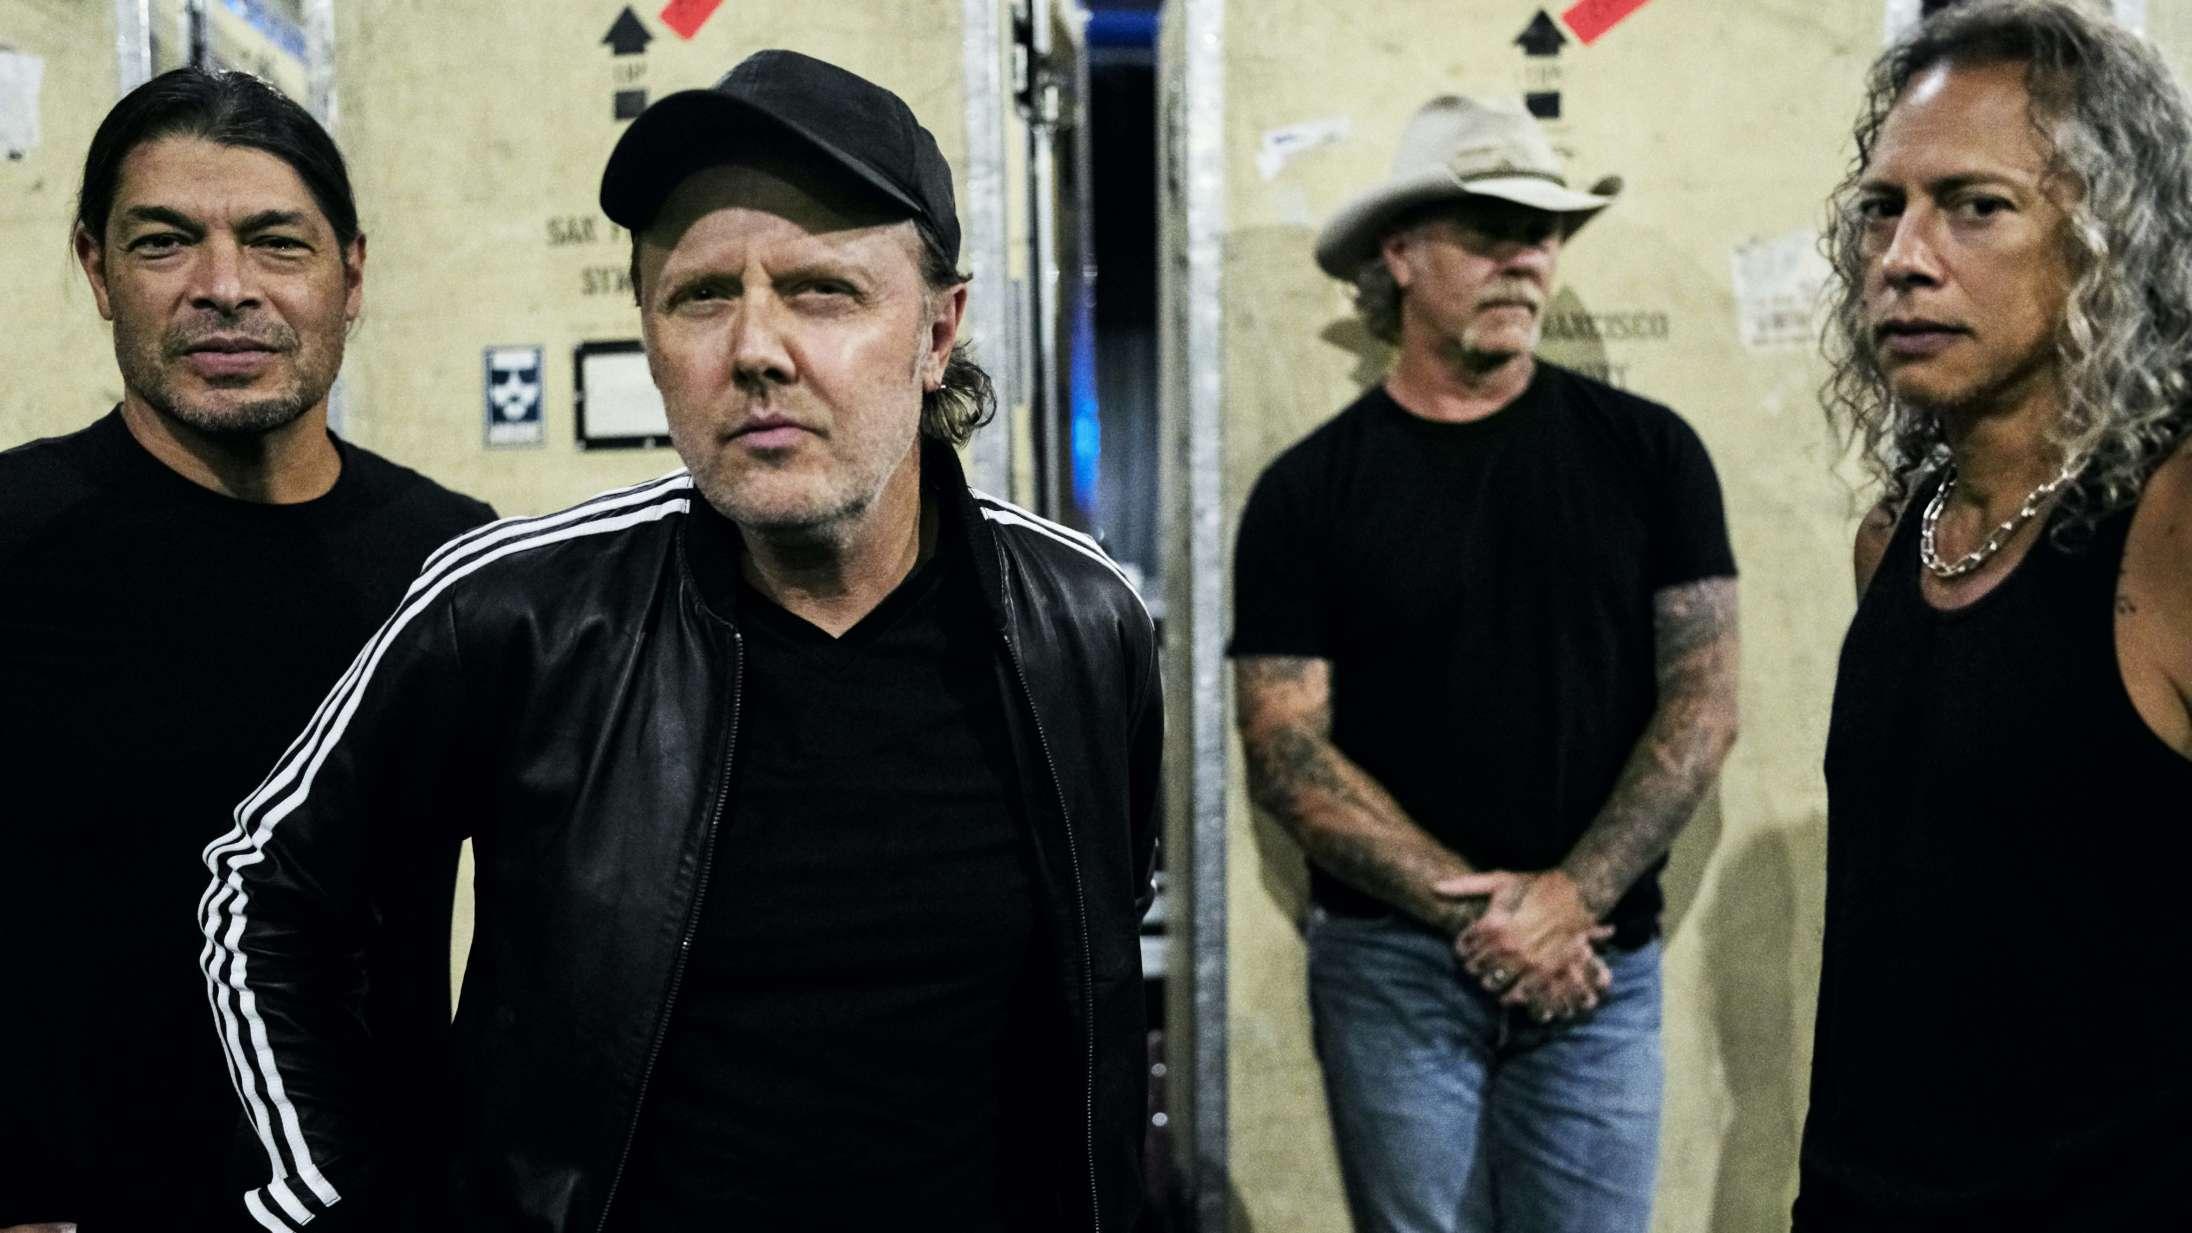 Metallica kommer til Danmark – eneste nordiske koncert i hele 2022